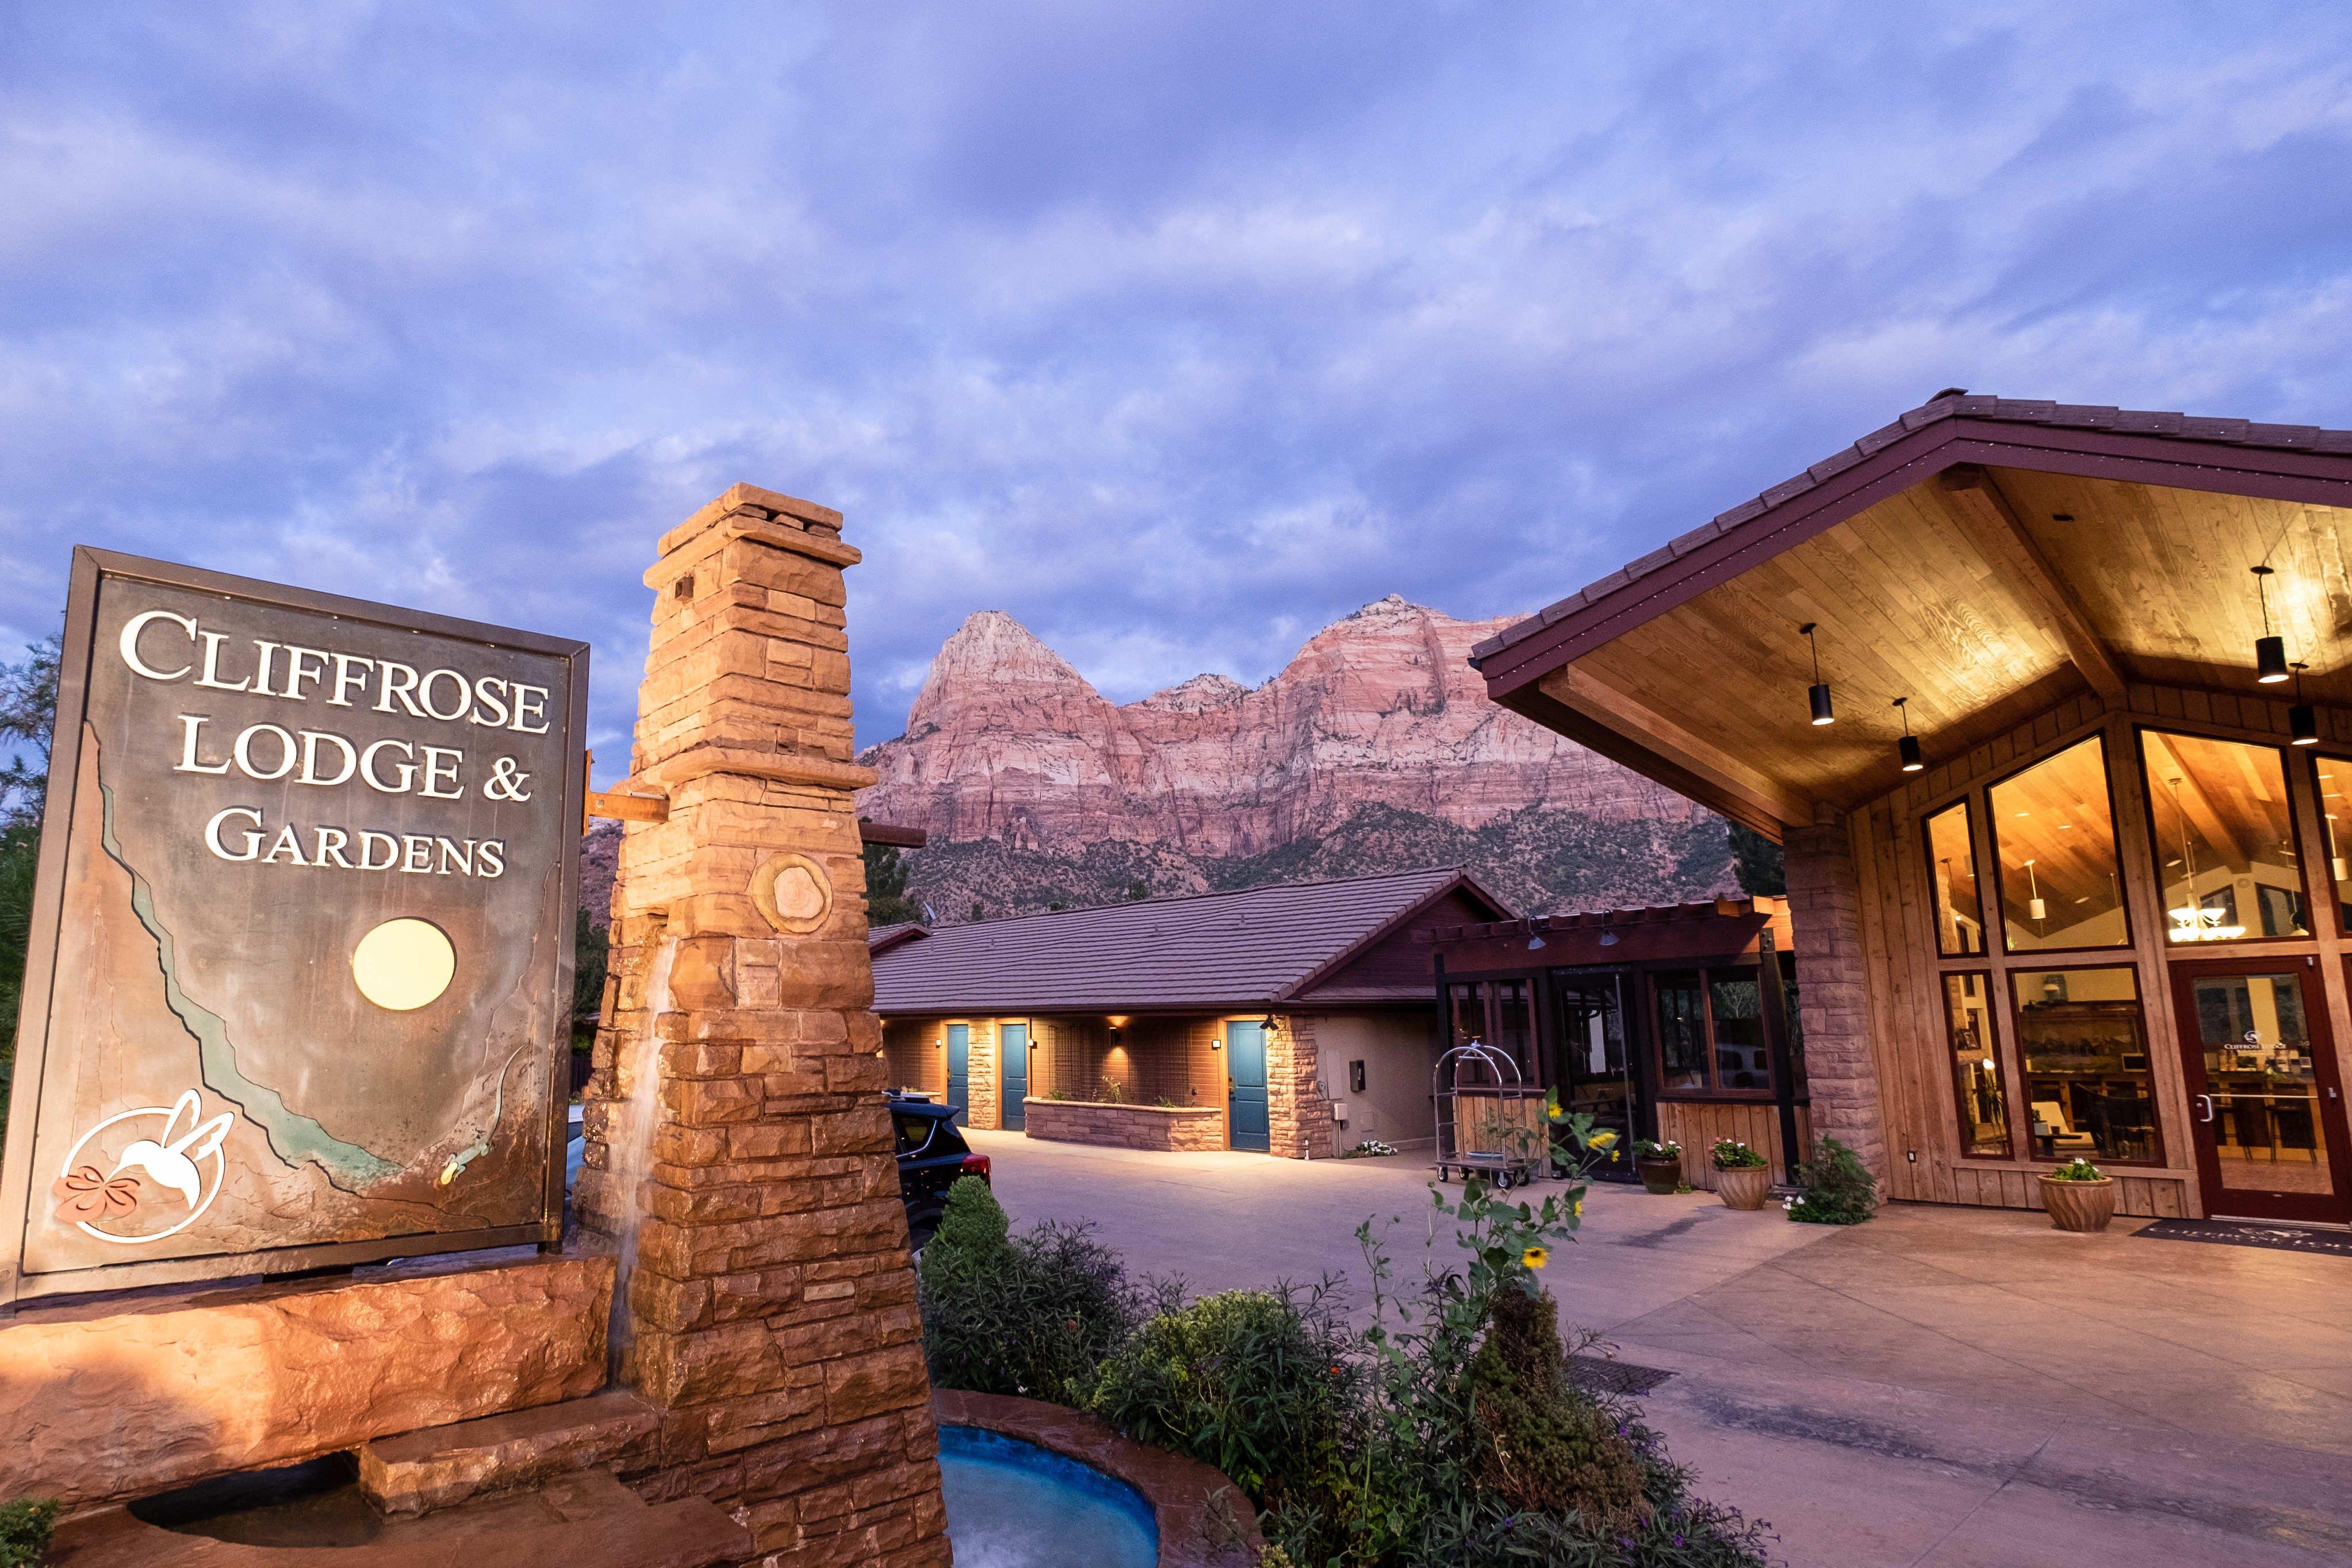 6a73ab55dac3475096b3c0bc23300ec1 - Cliffrose Lodge & Gardens At Zion Natl Park